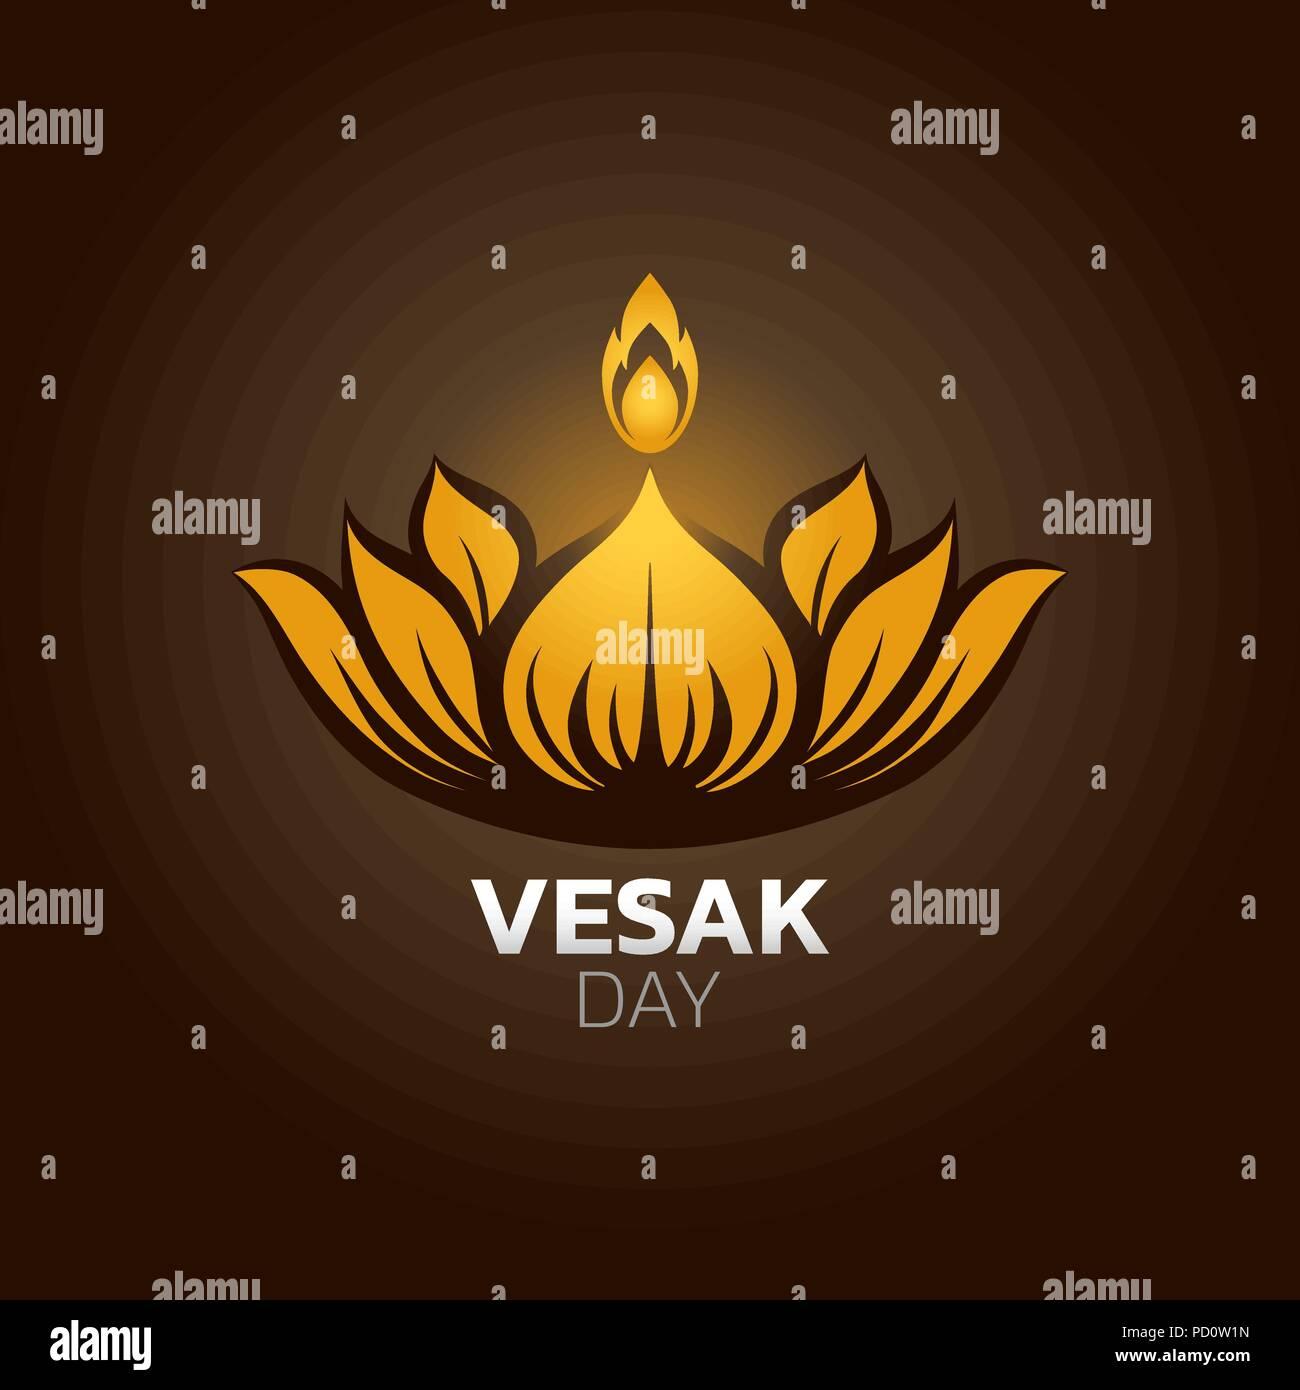 Vesak Day Celebration Stockfotos und -bilder Kaufen - Alamy